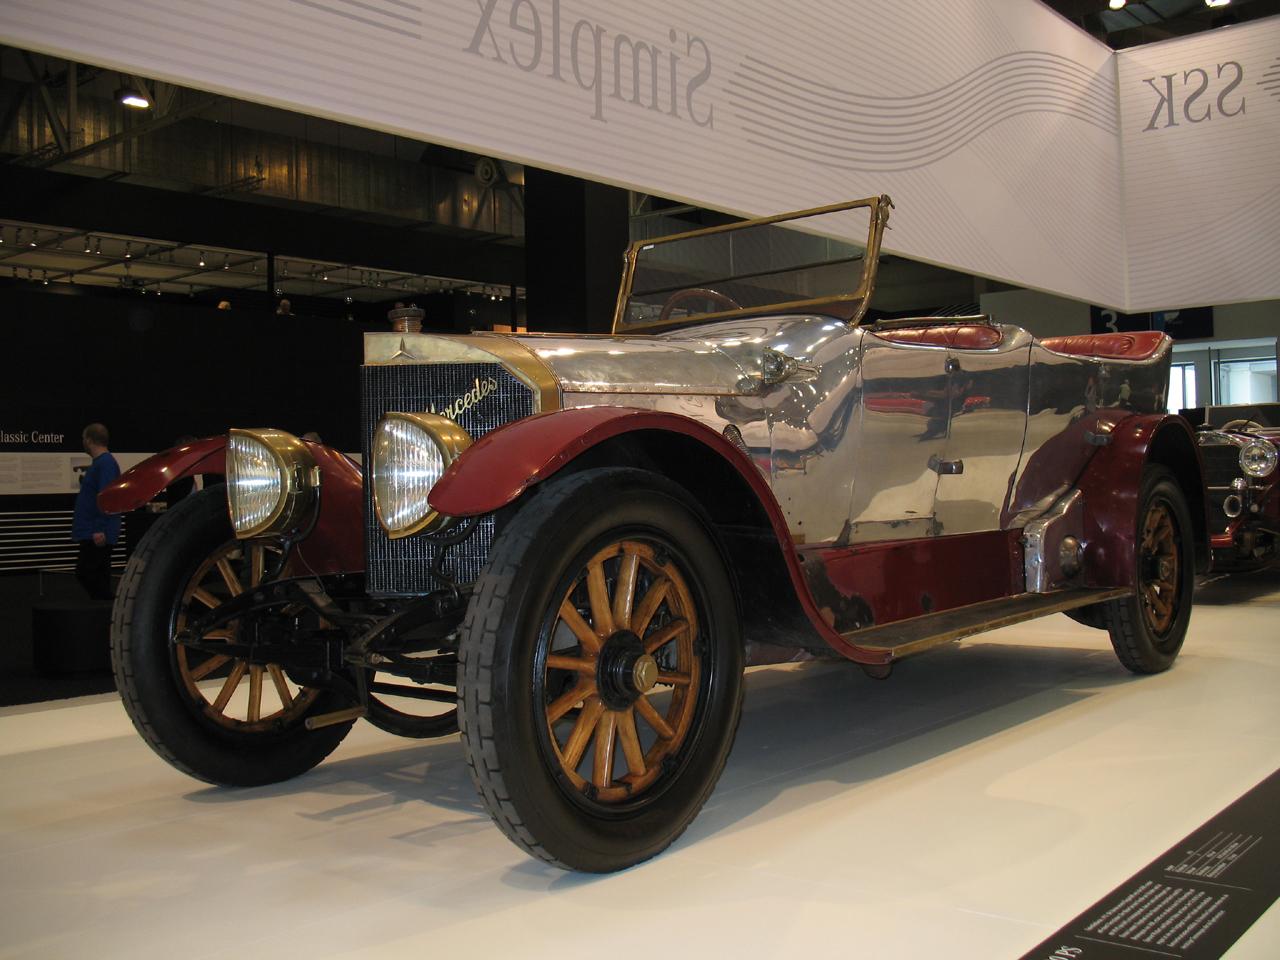 Mercedes-37-90-ps-1911.jpg